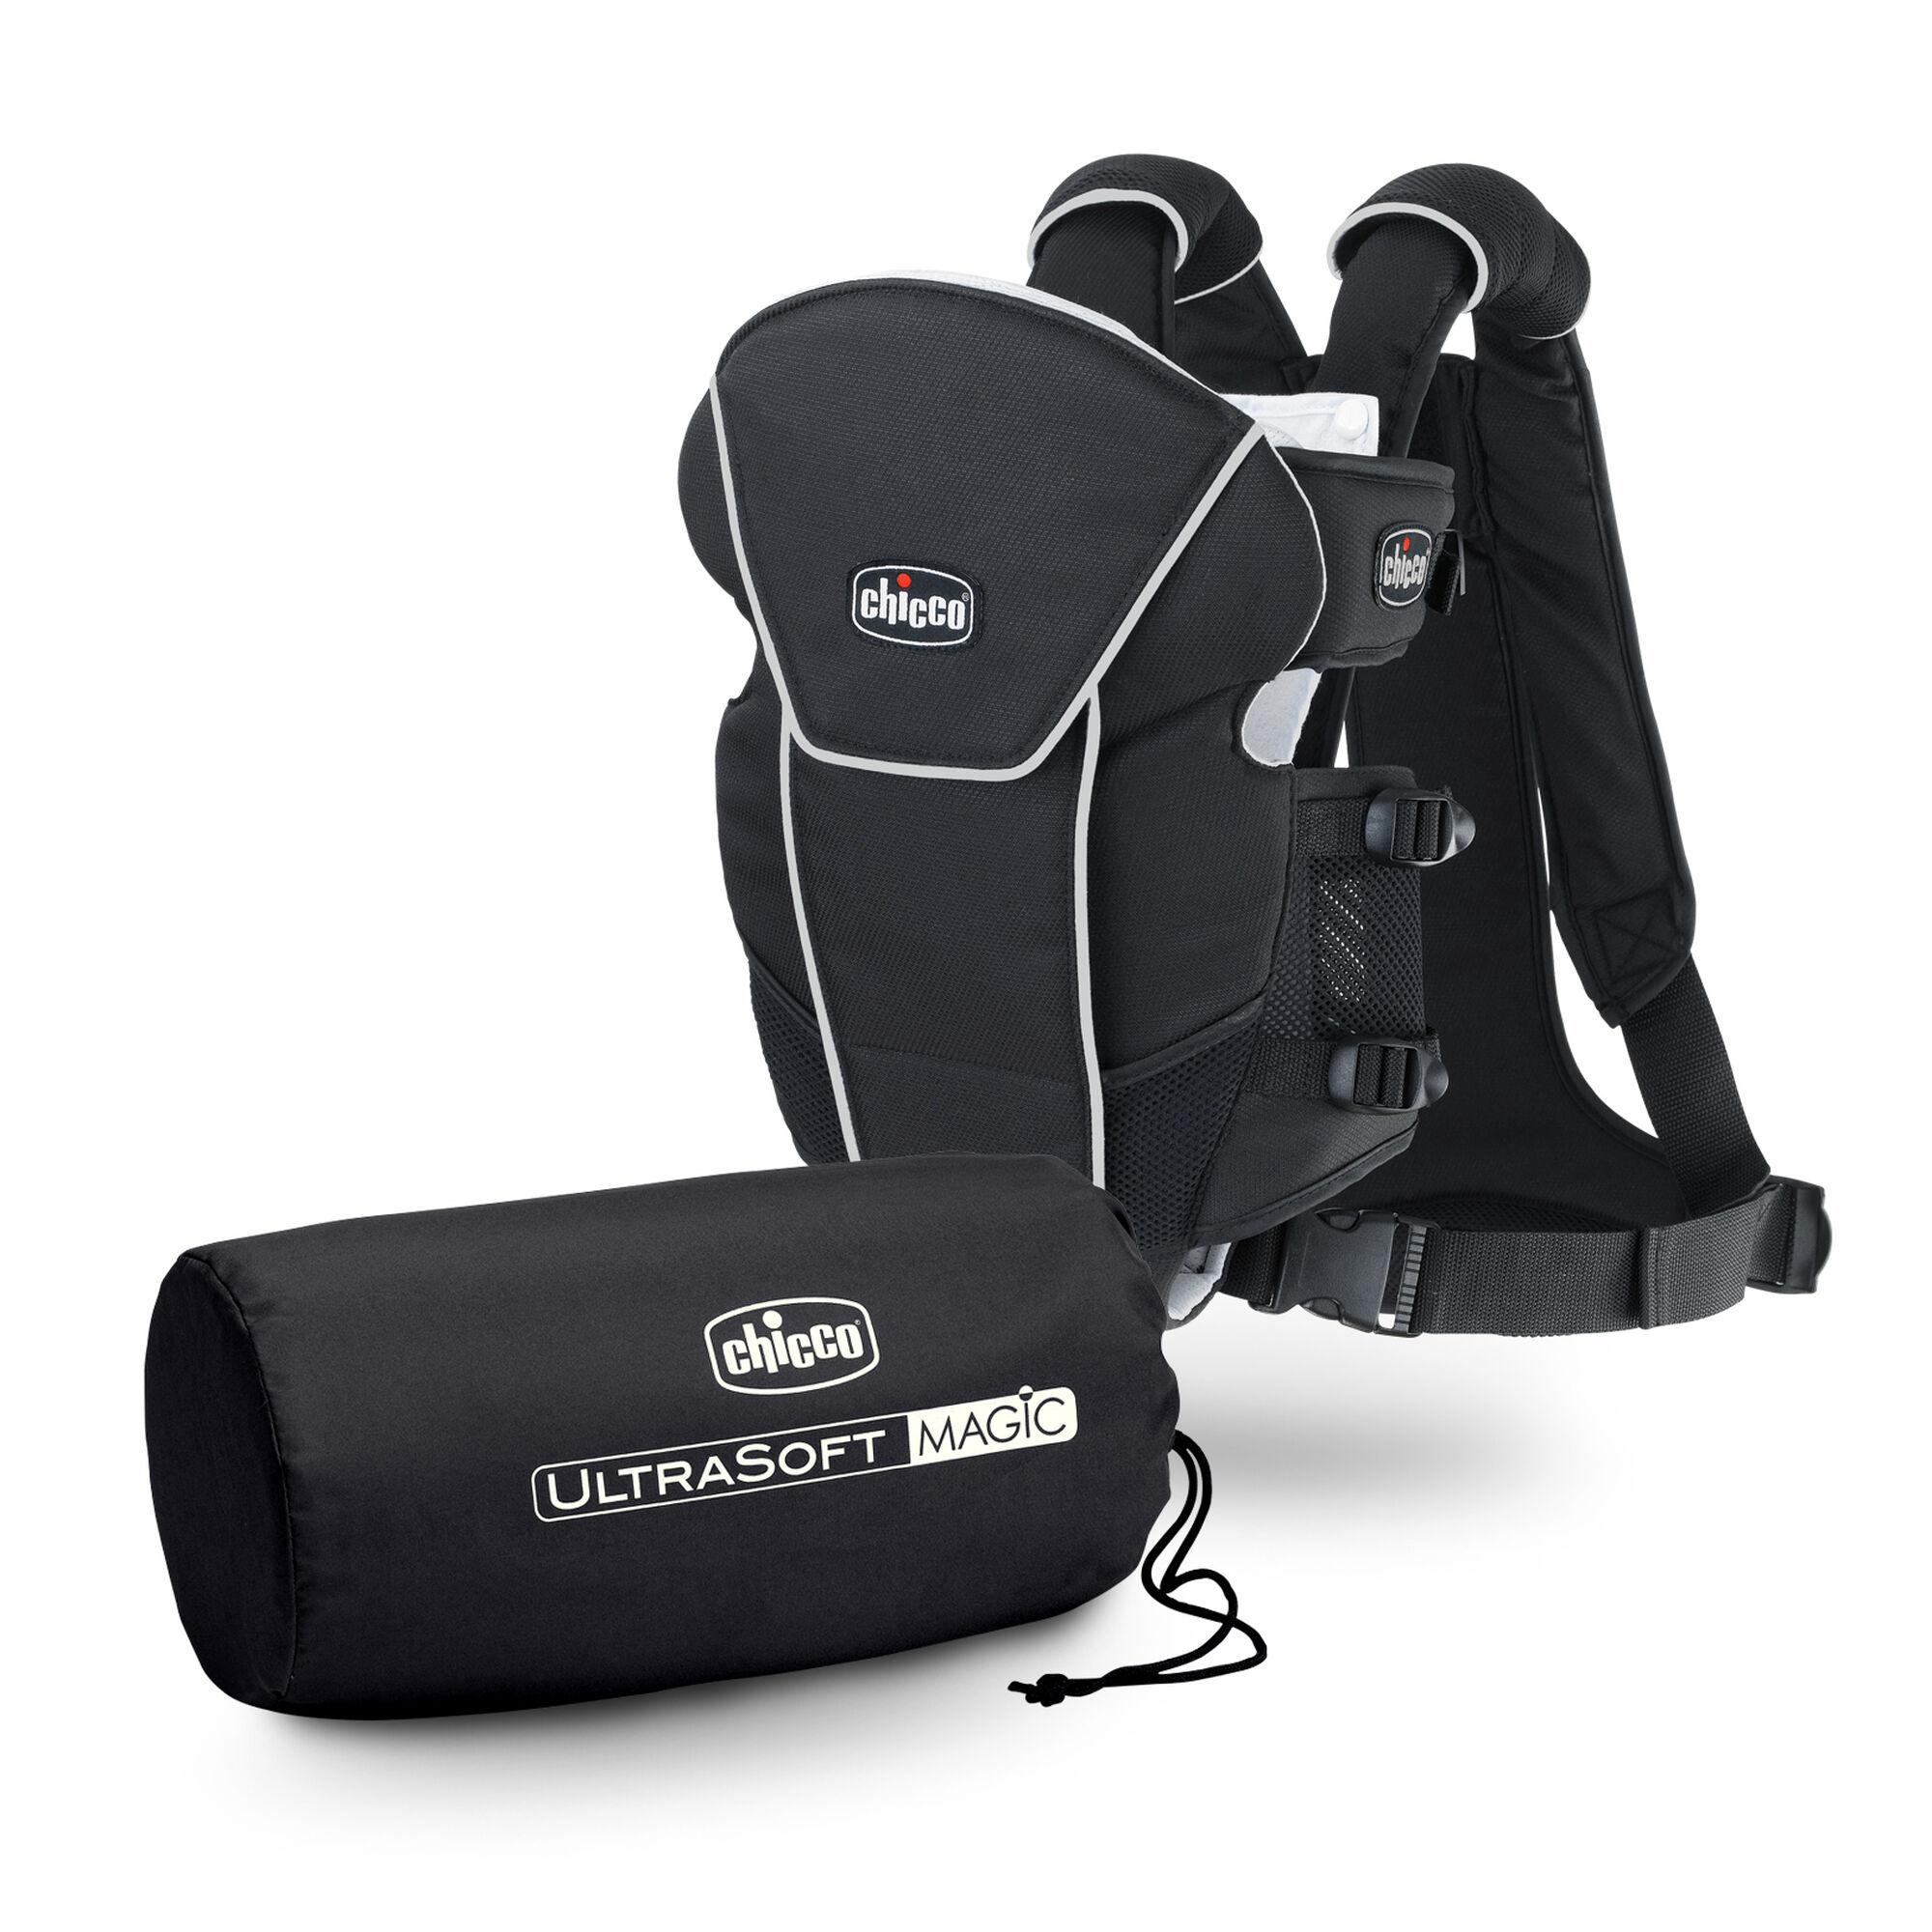 Ultrasoft Magic Infant Carrier Black